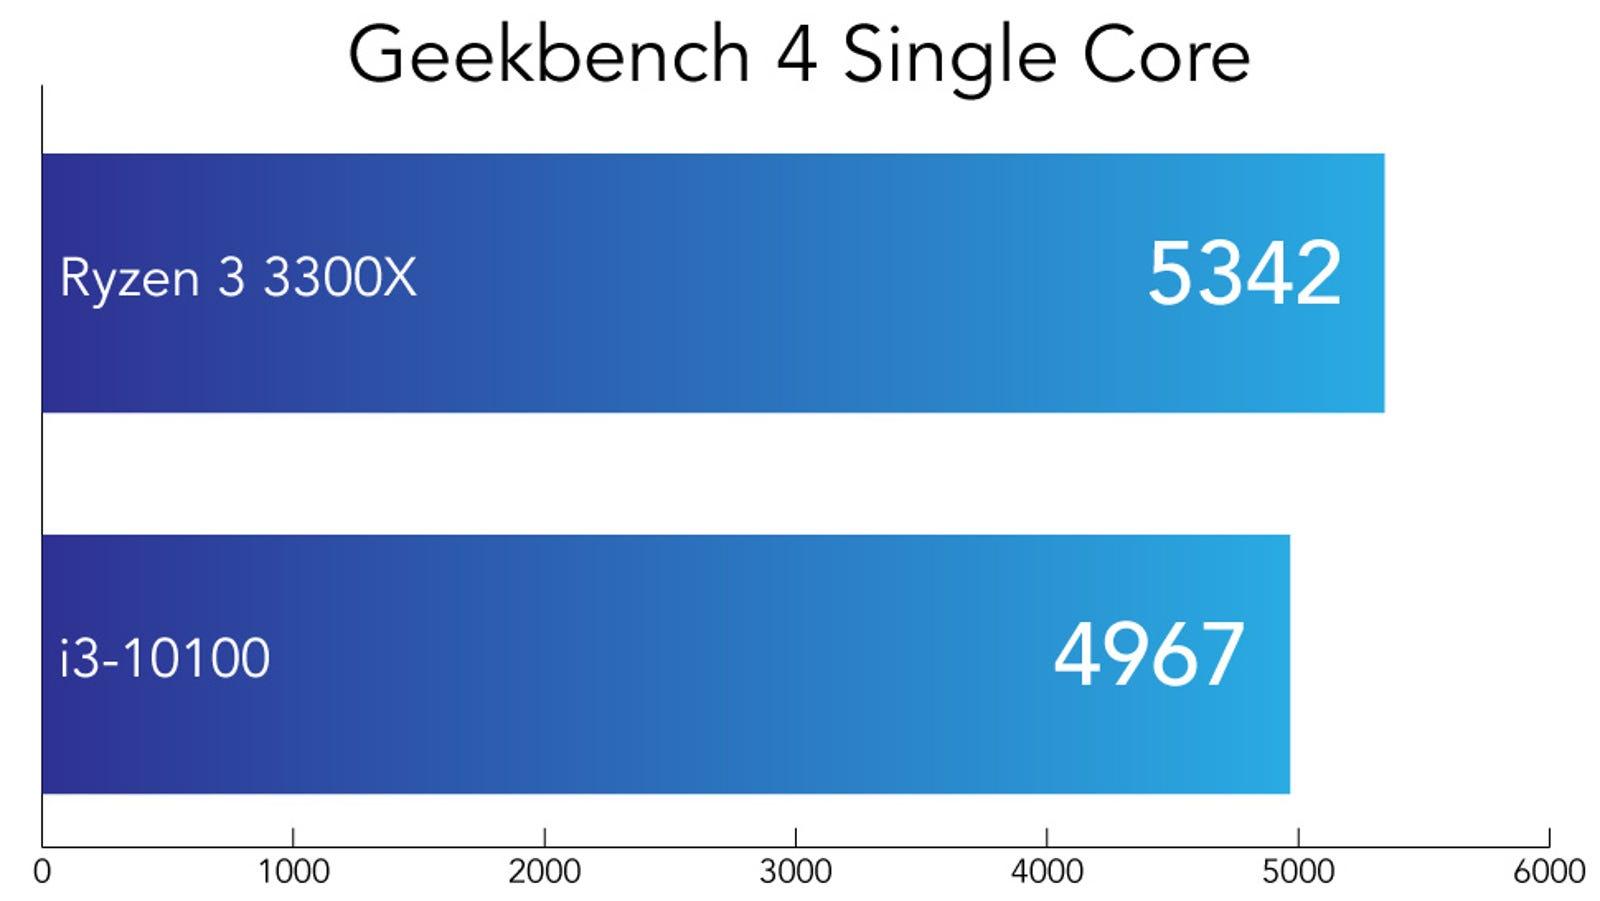 The Geekbench 4 Single Core score. Higher is better.